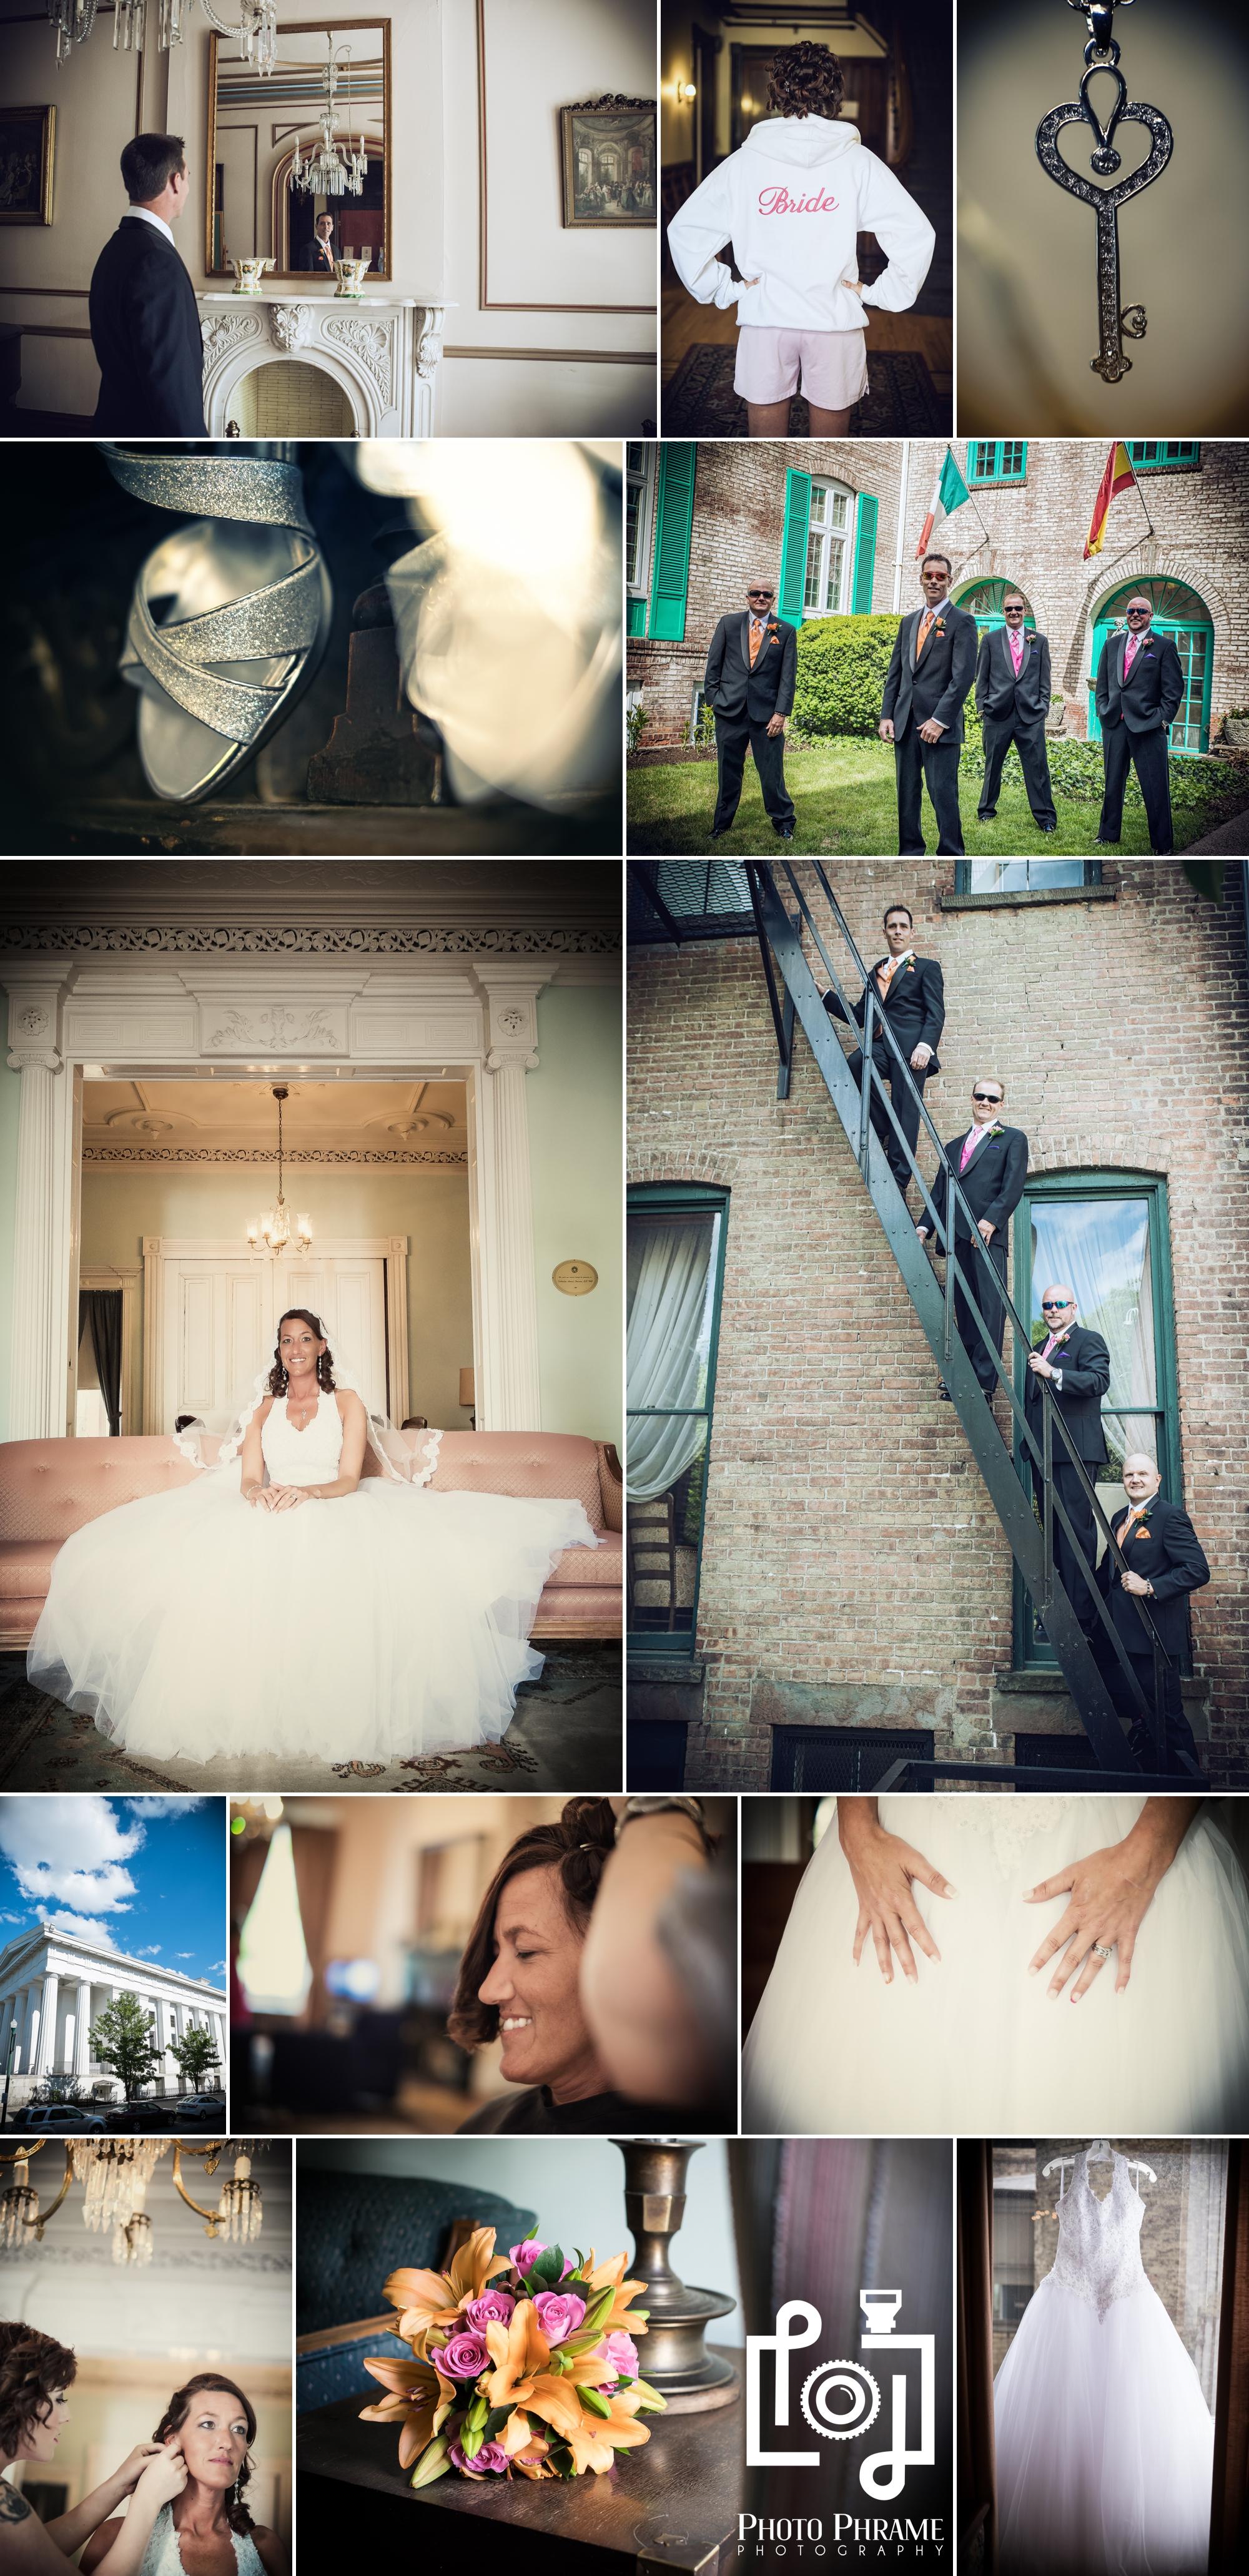 Albany, Schenectady Troy Wedding Photography